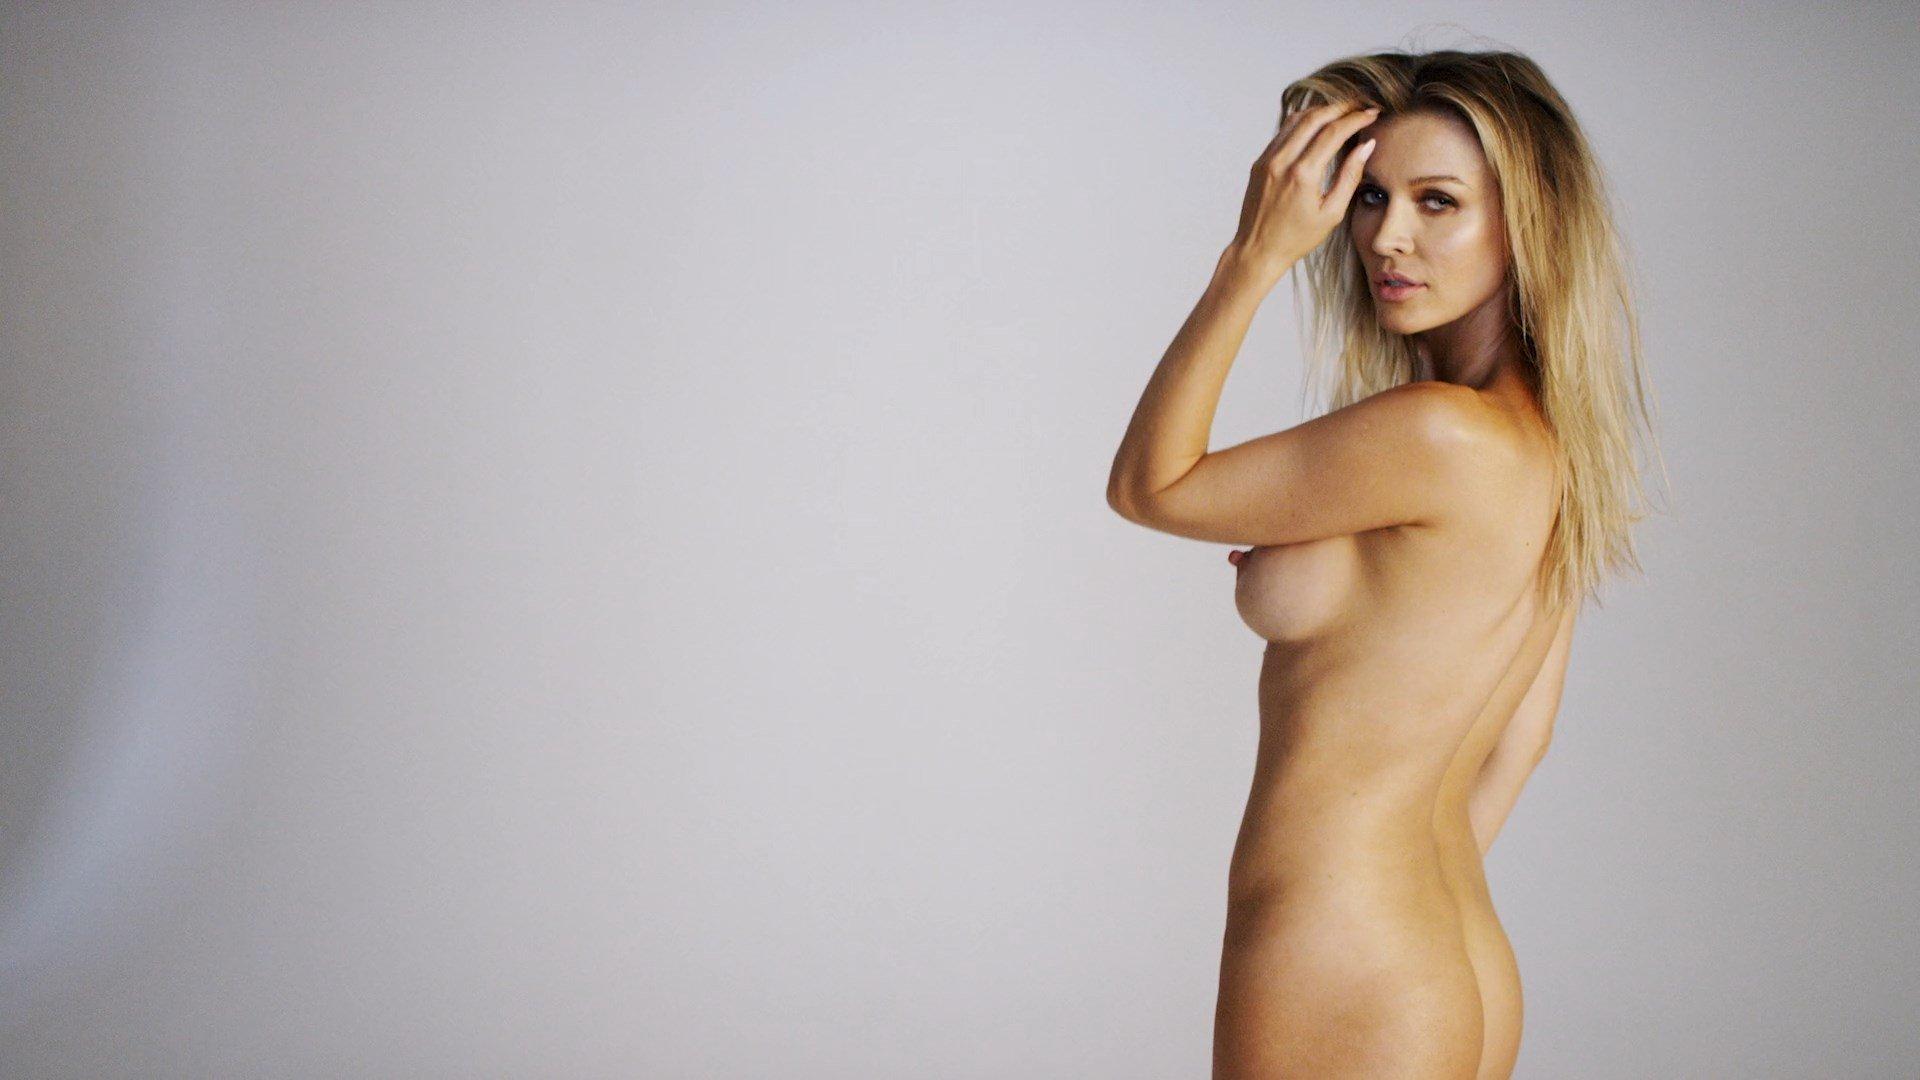 Mara kelly nude